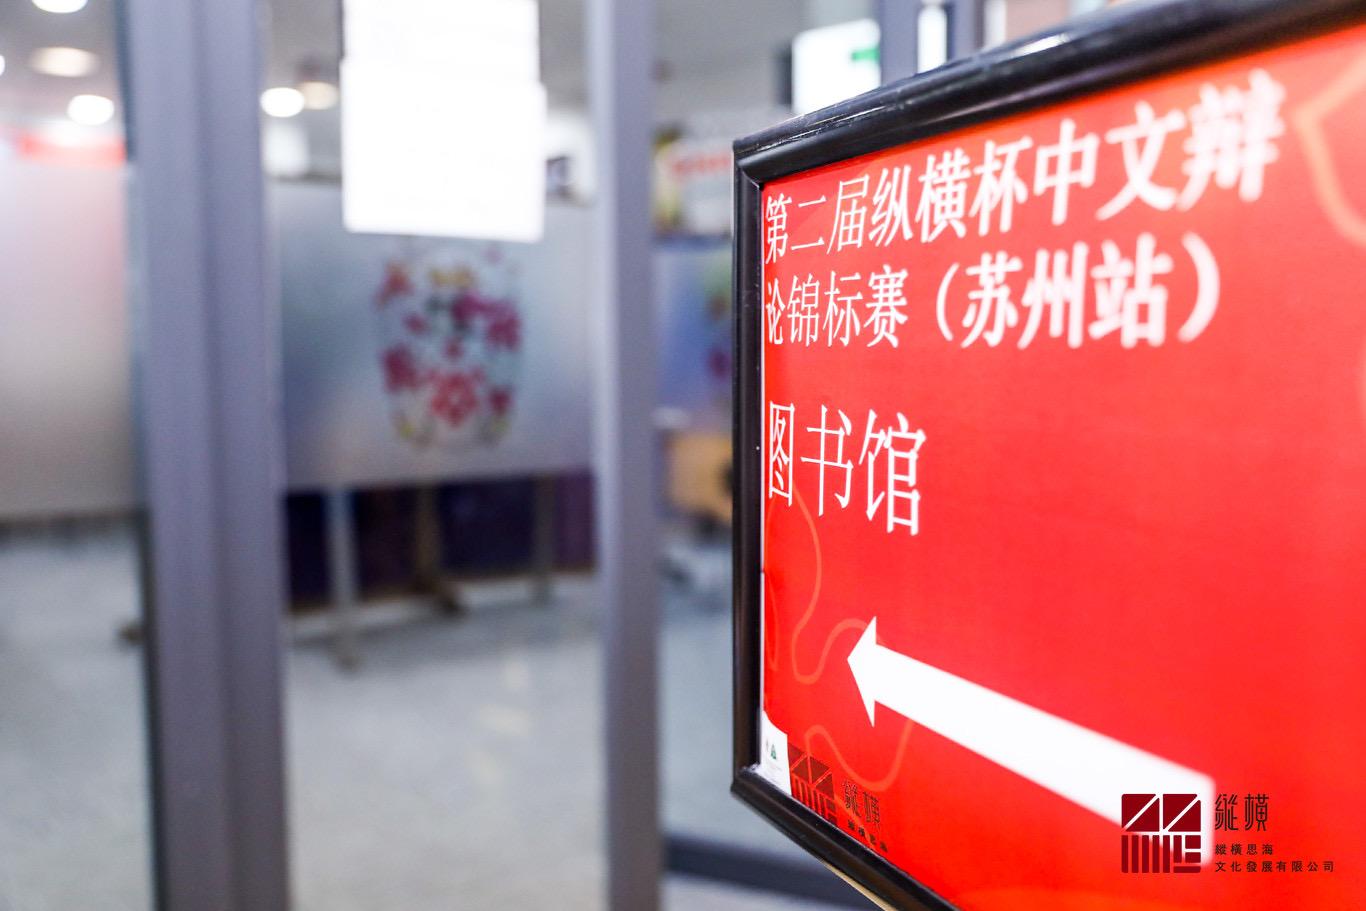 c8fe2ae027d469a49f262287aaac6a6-Dulwich_International_High_School_Suzhou